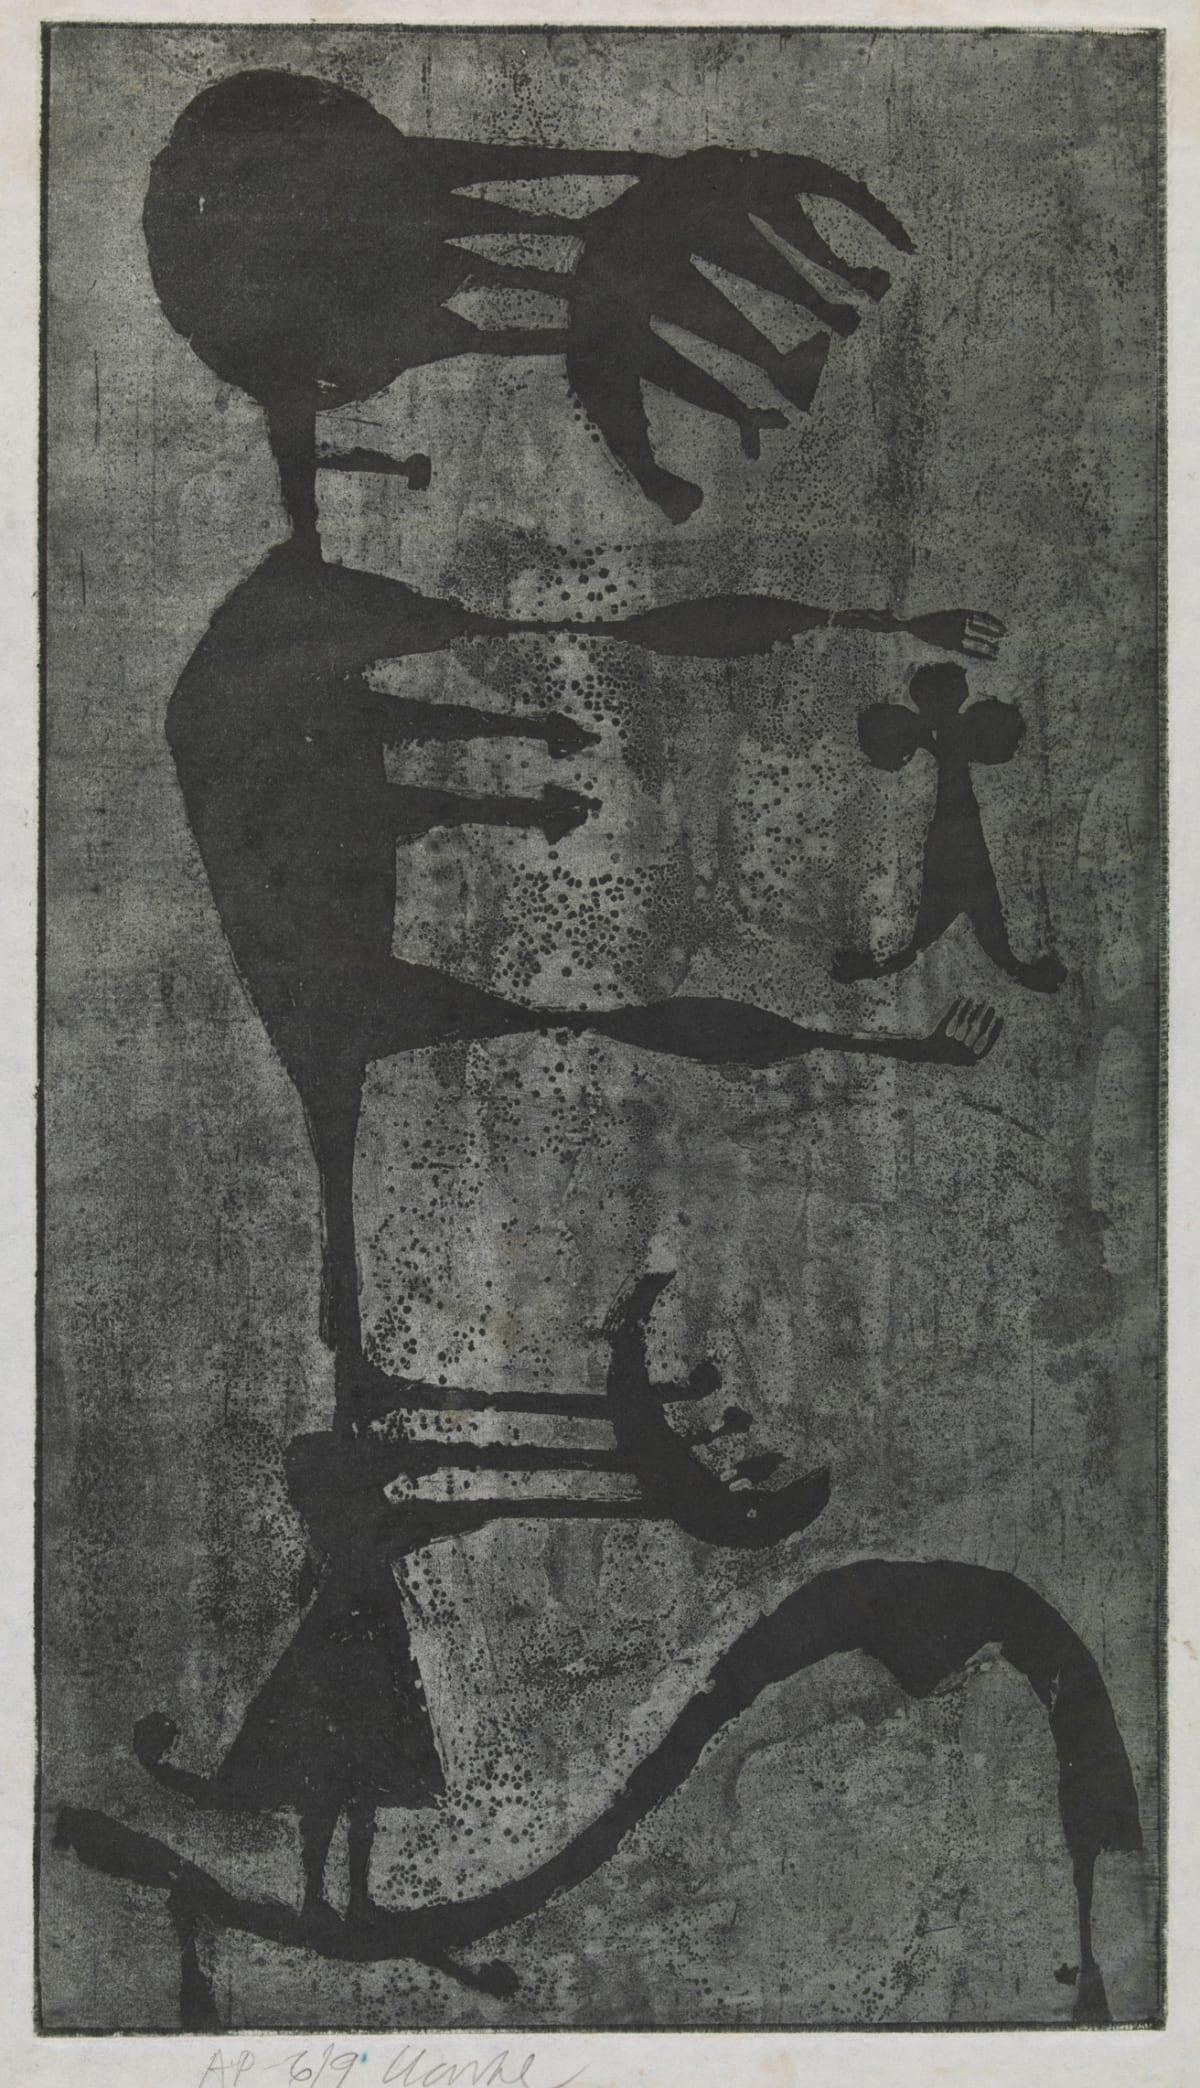 Geoffrey Clarke, Love of Nature, 1950